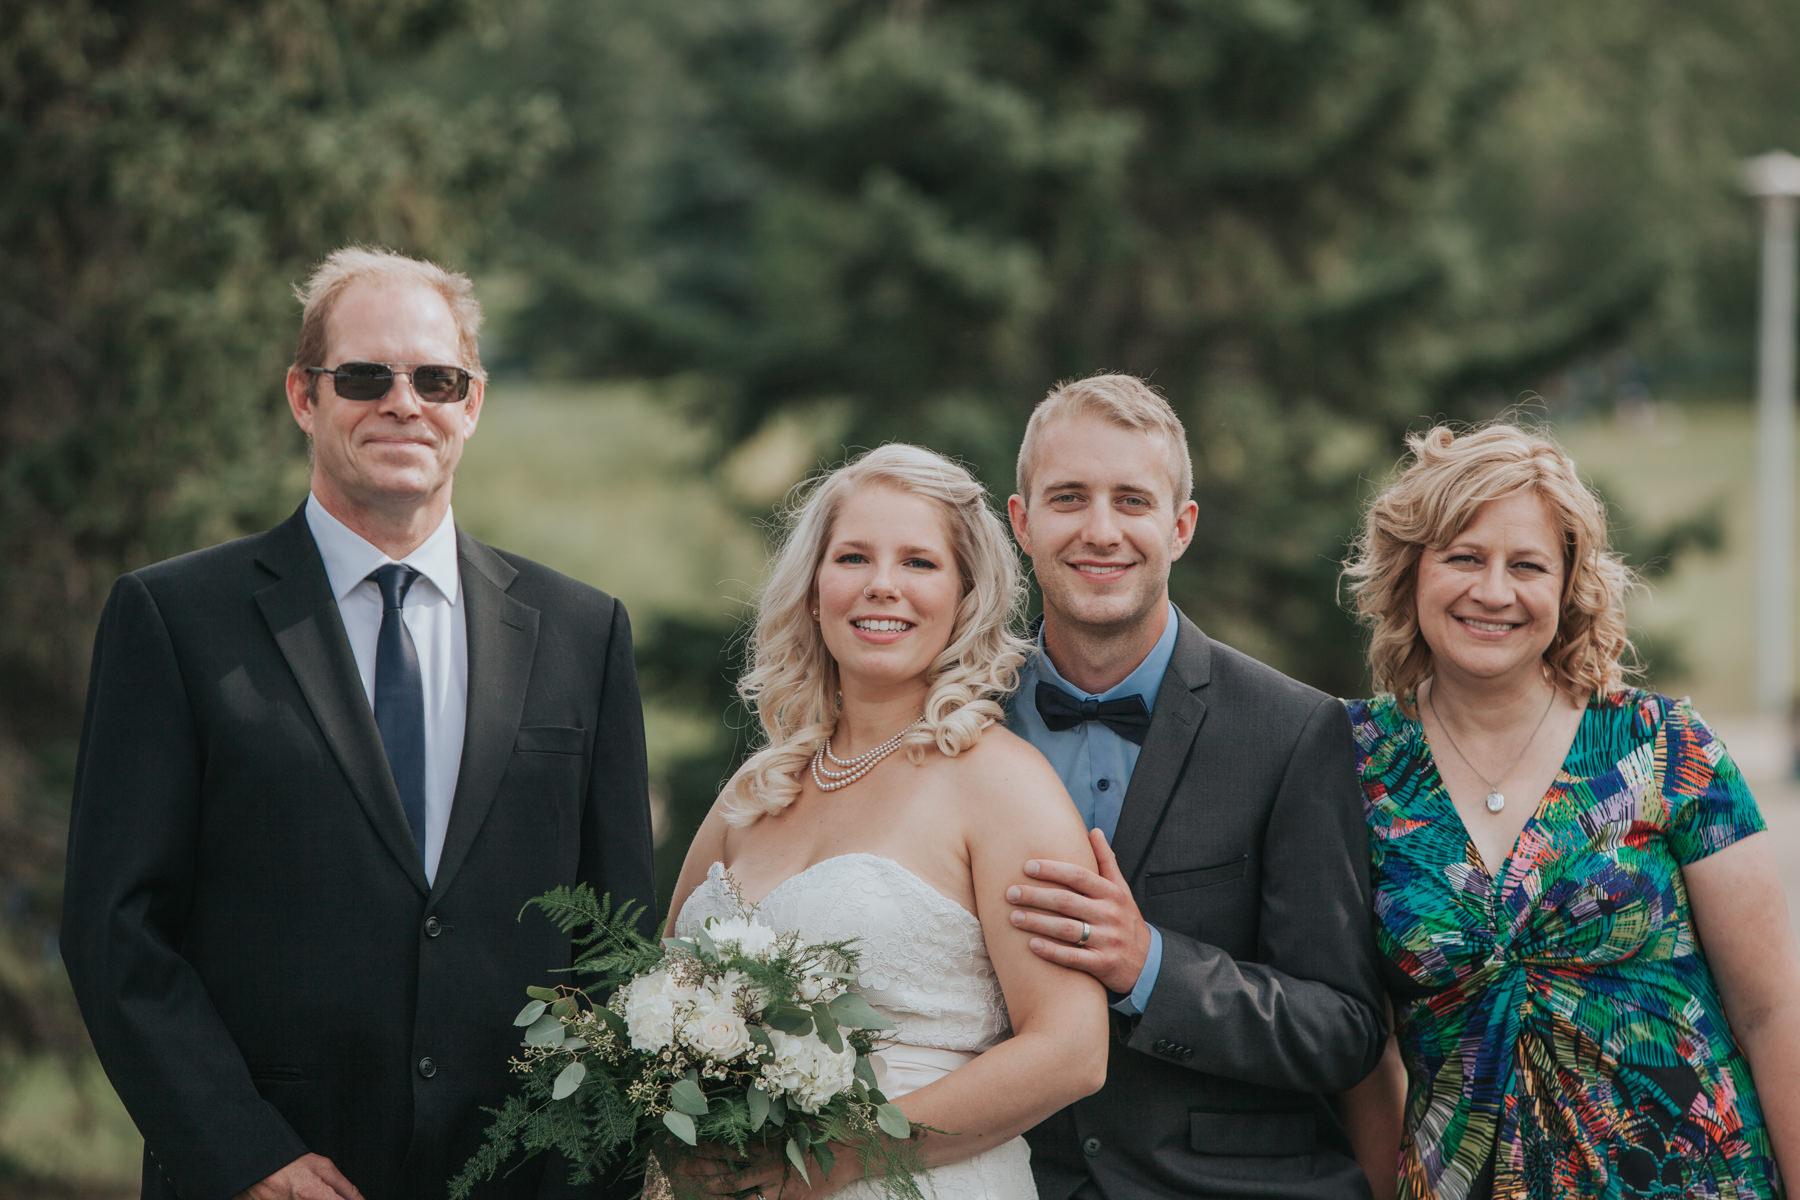 Vancouver wedding photographer Jess 29